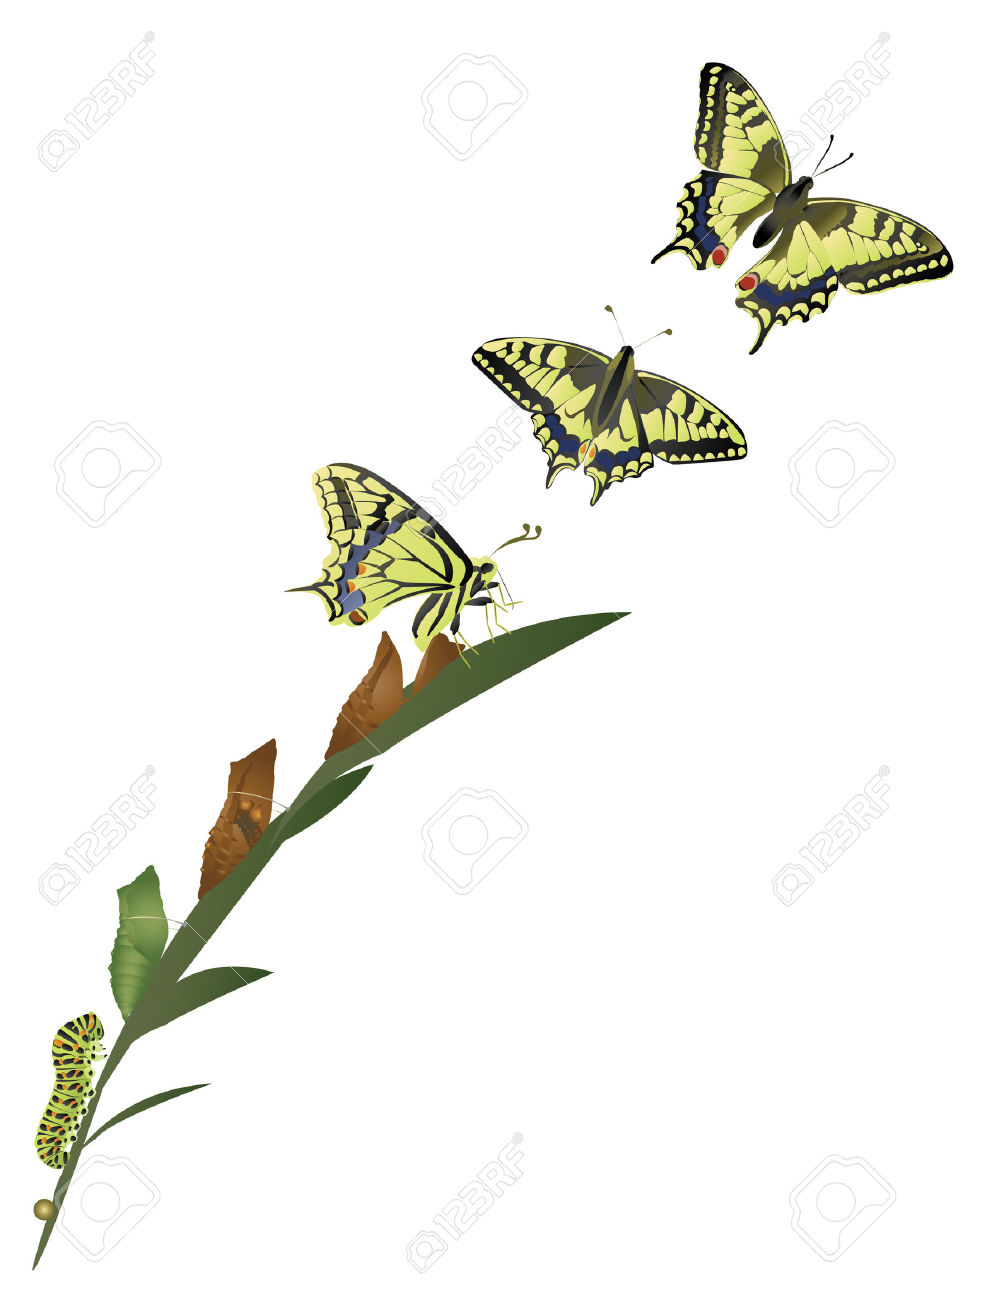 Butterfly metamorphosis clipart.